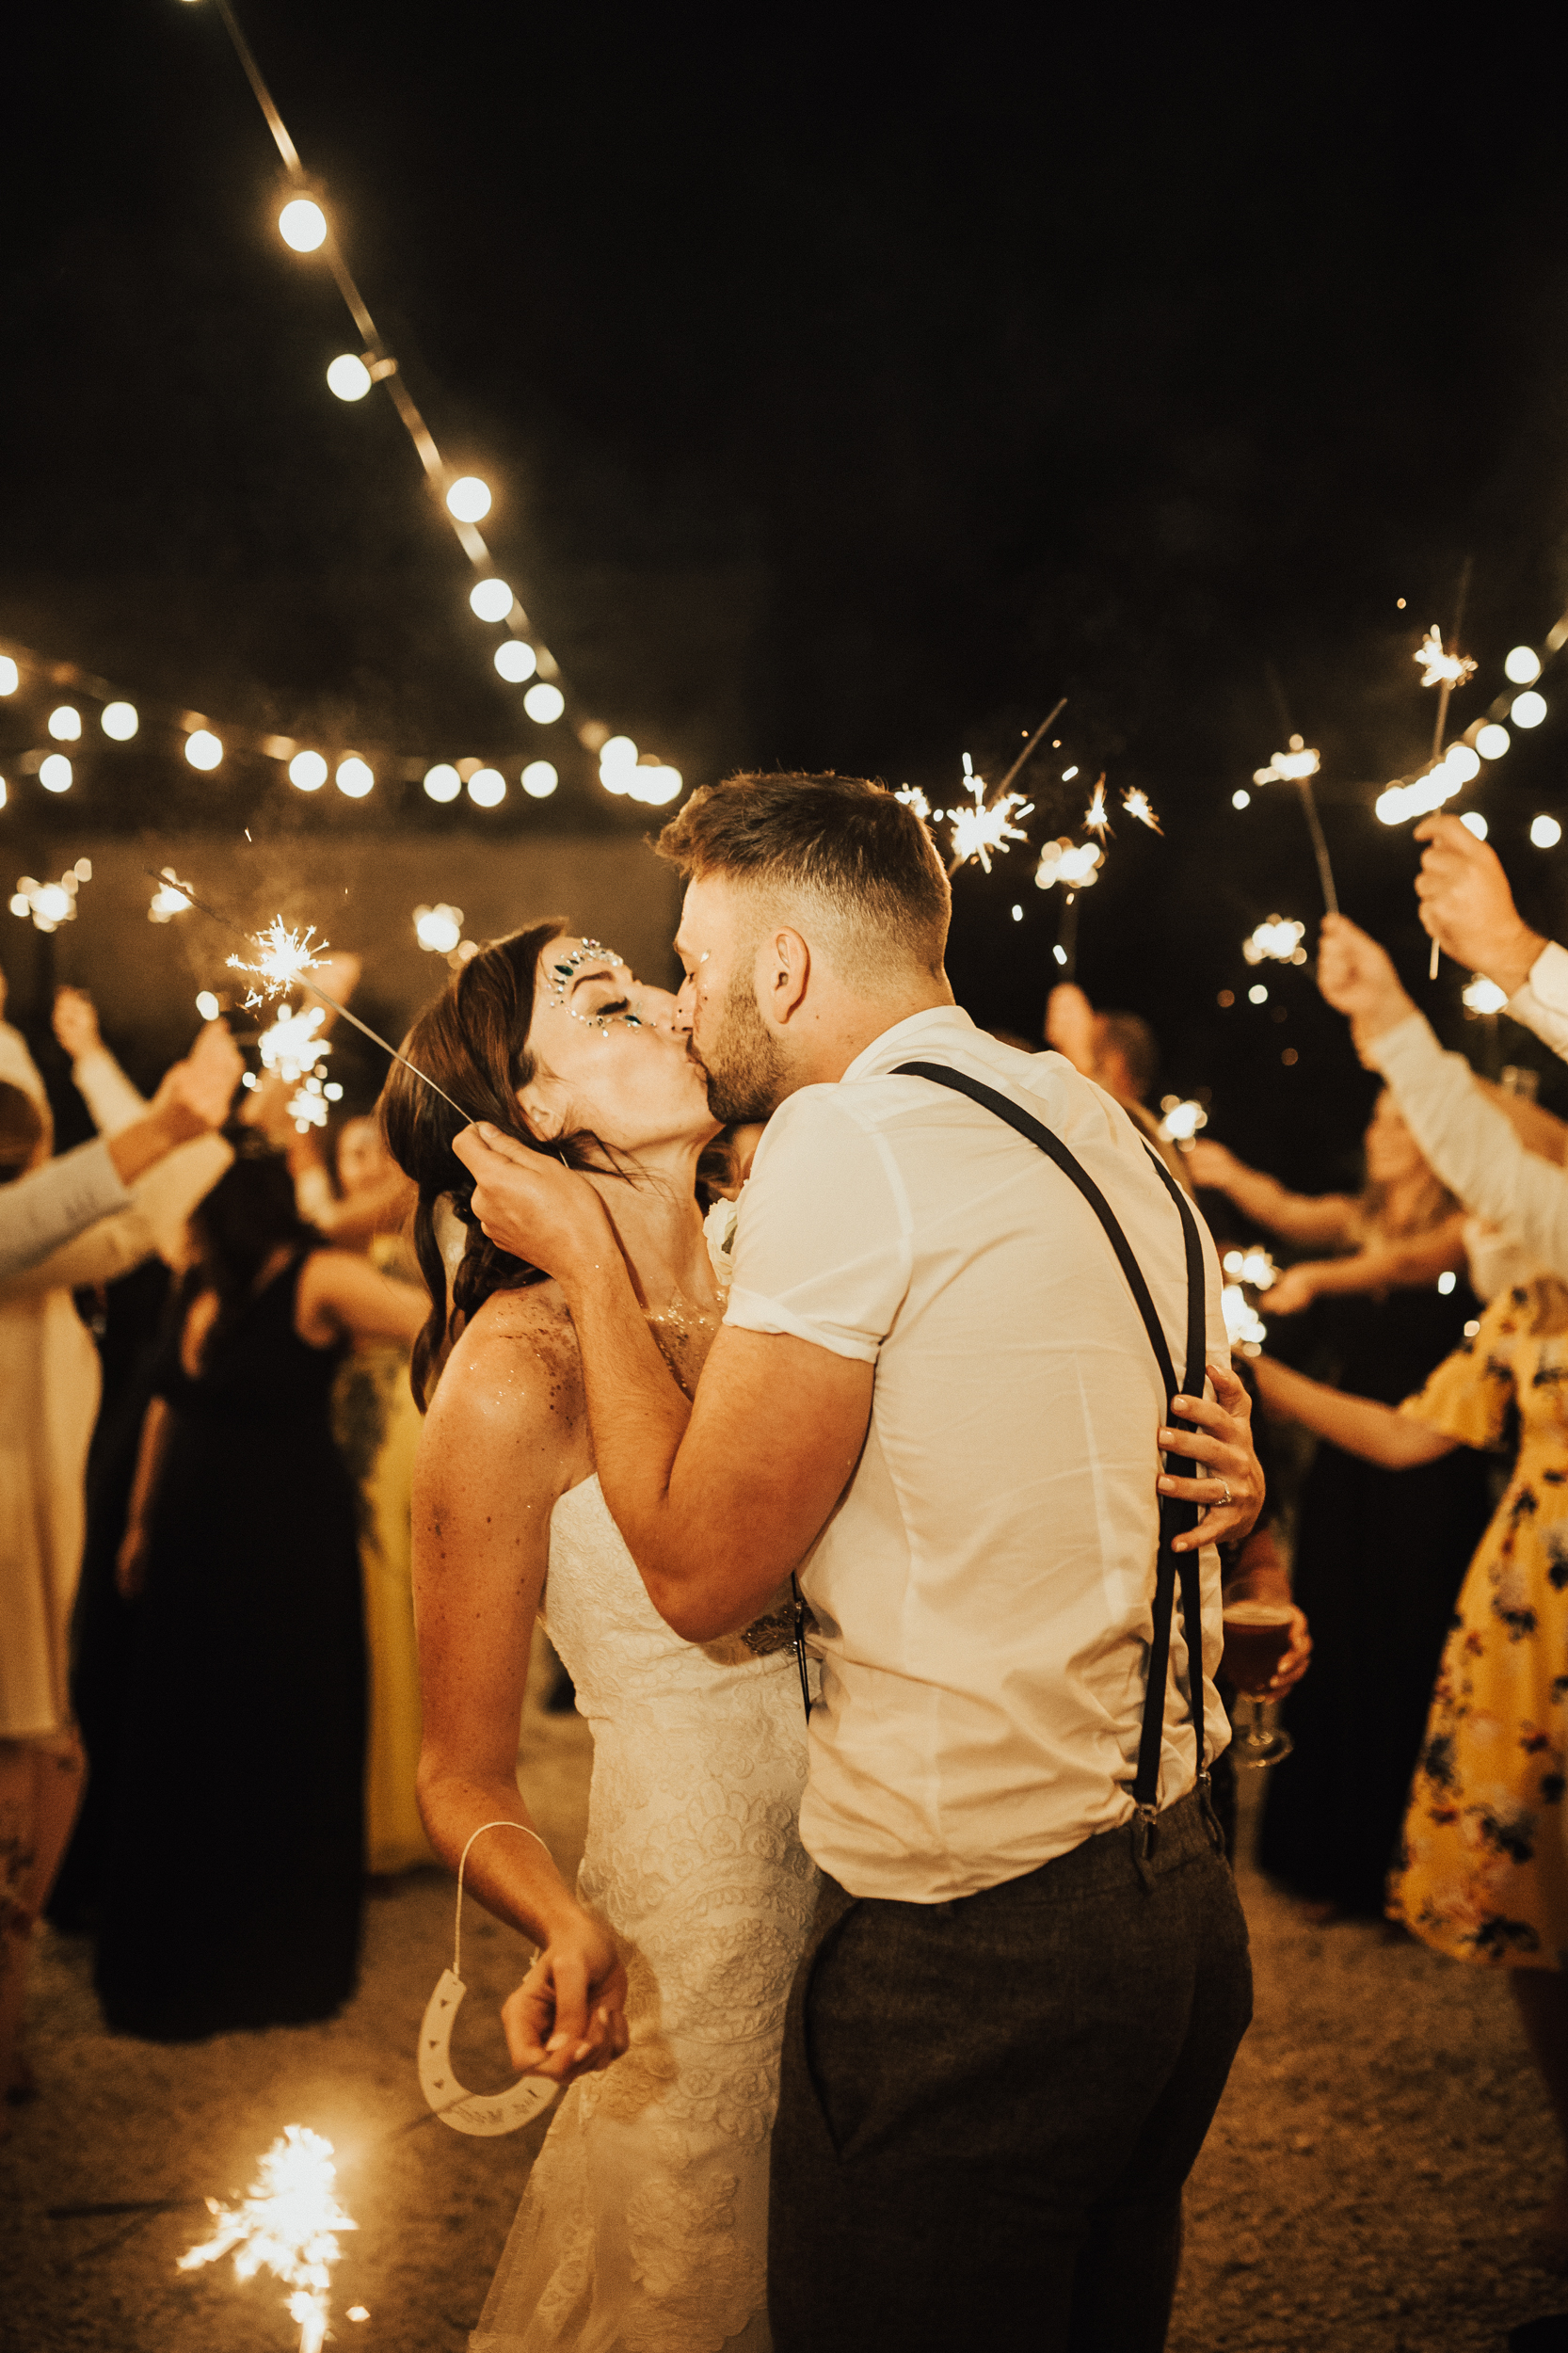 Amy-Zac-Destination-Wedding-France-Manoir-Foulquetiere-Darina-Stoda-Photography-129.jpg